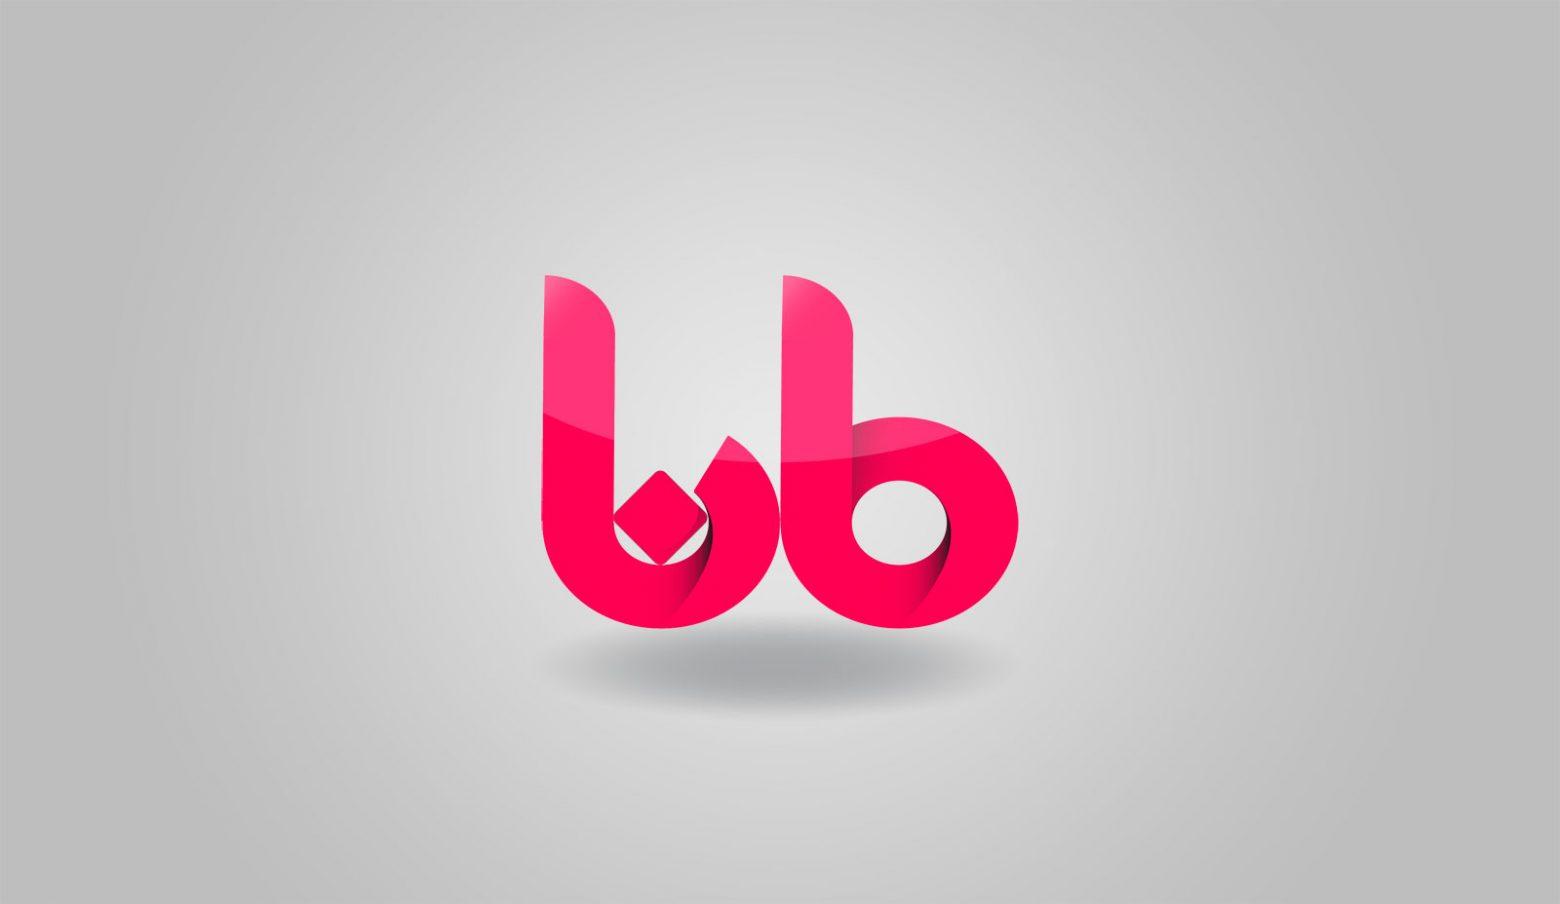 mana logo 1560x904 - لوگو